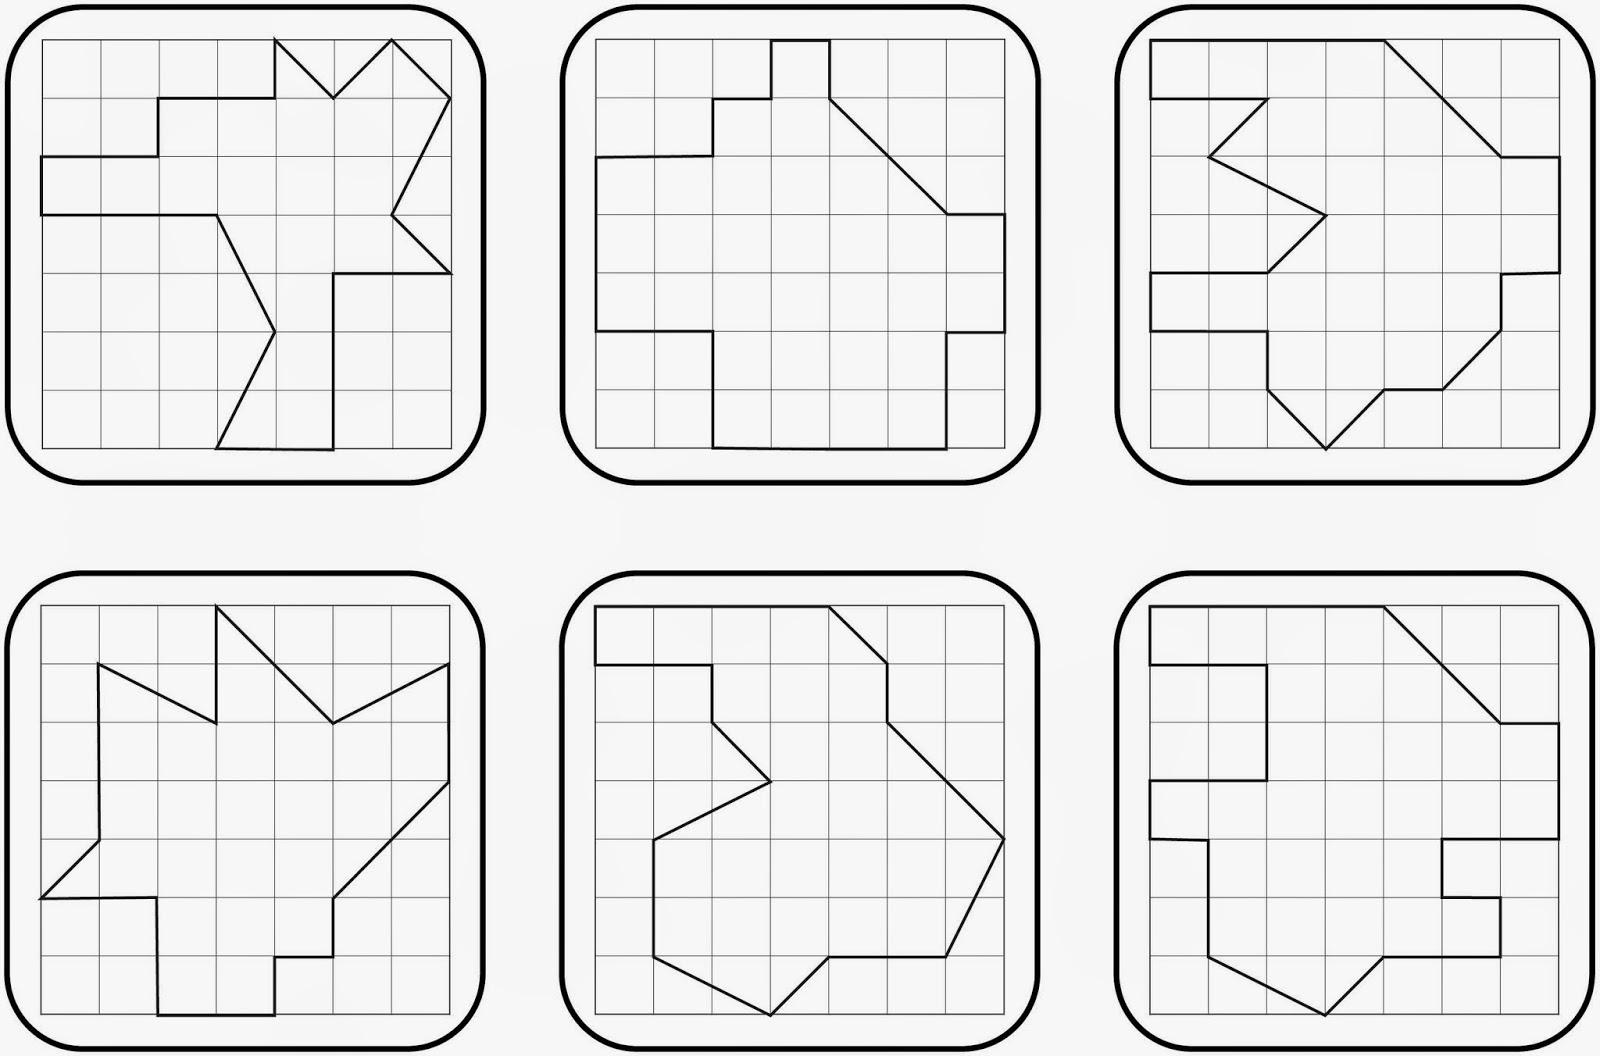 Atemberaubend Winkel In Polygone Arbeitsblatt Bilder - Mathe ...